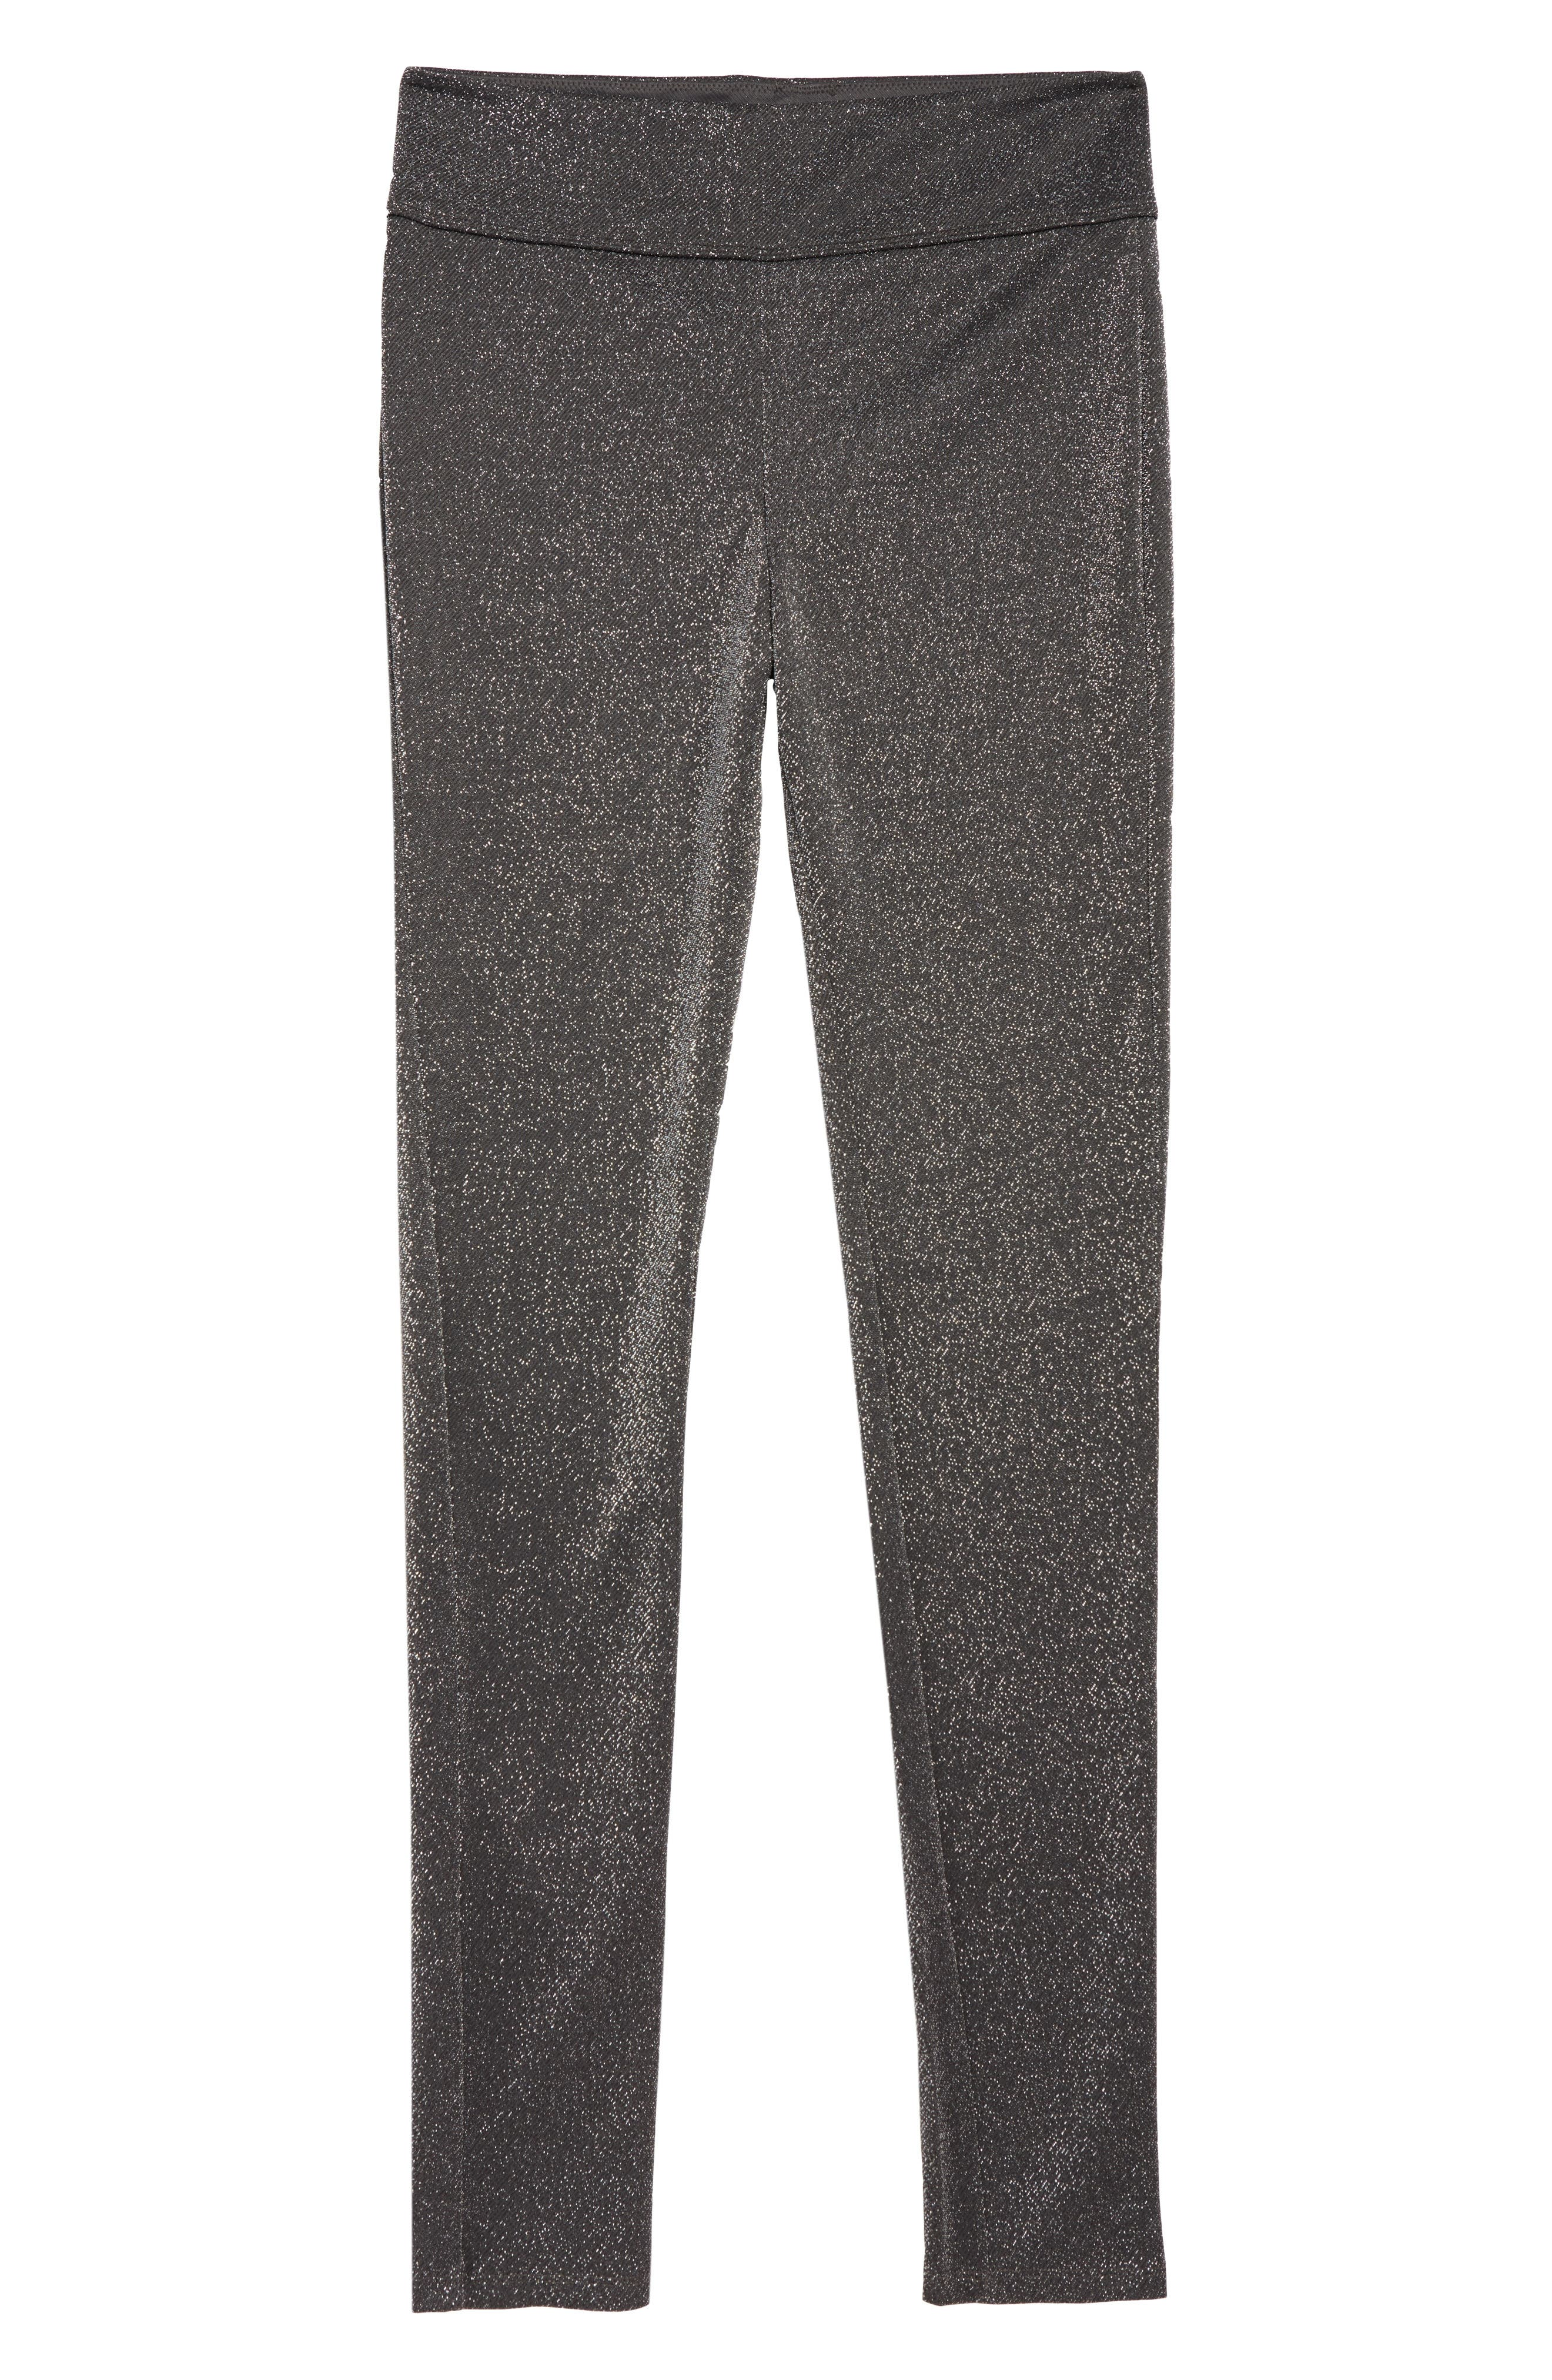 Sparkle High Waist Leggings,                         Main,                         color, GREY CASTLEROCK SPARKLE